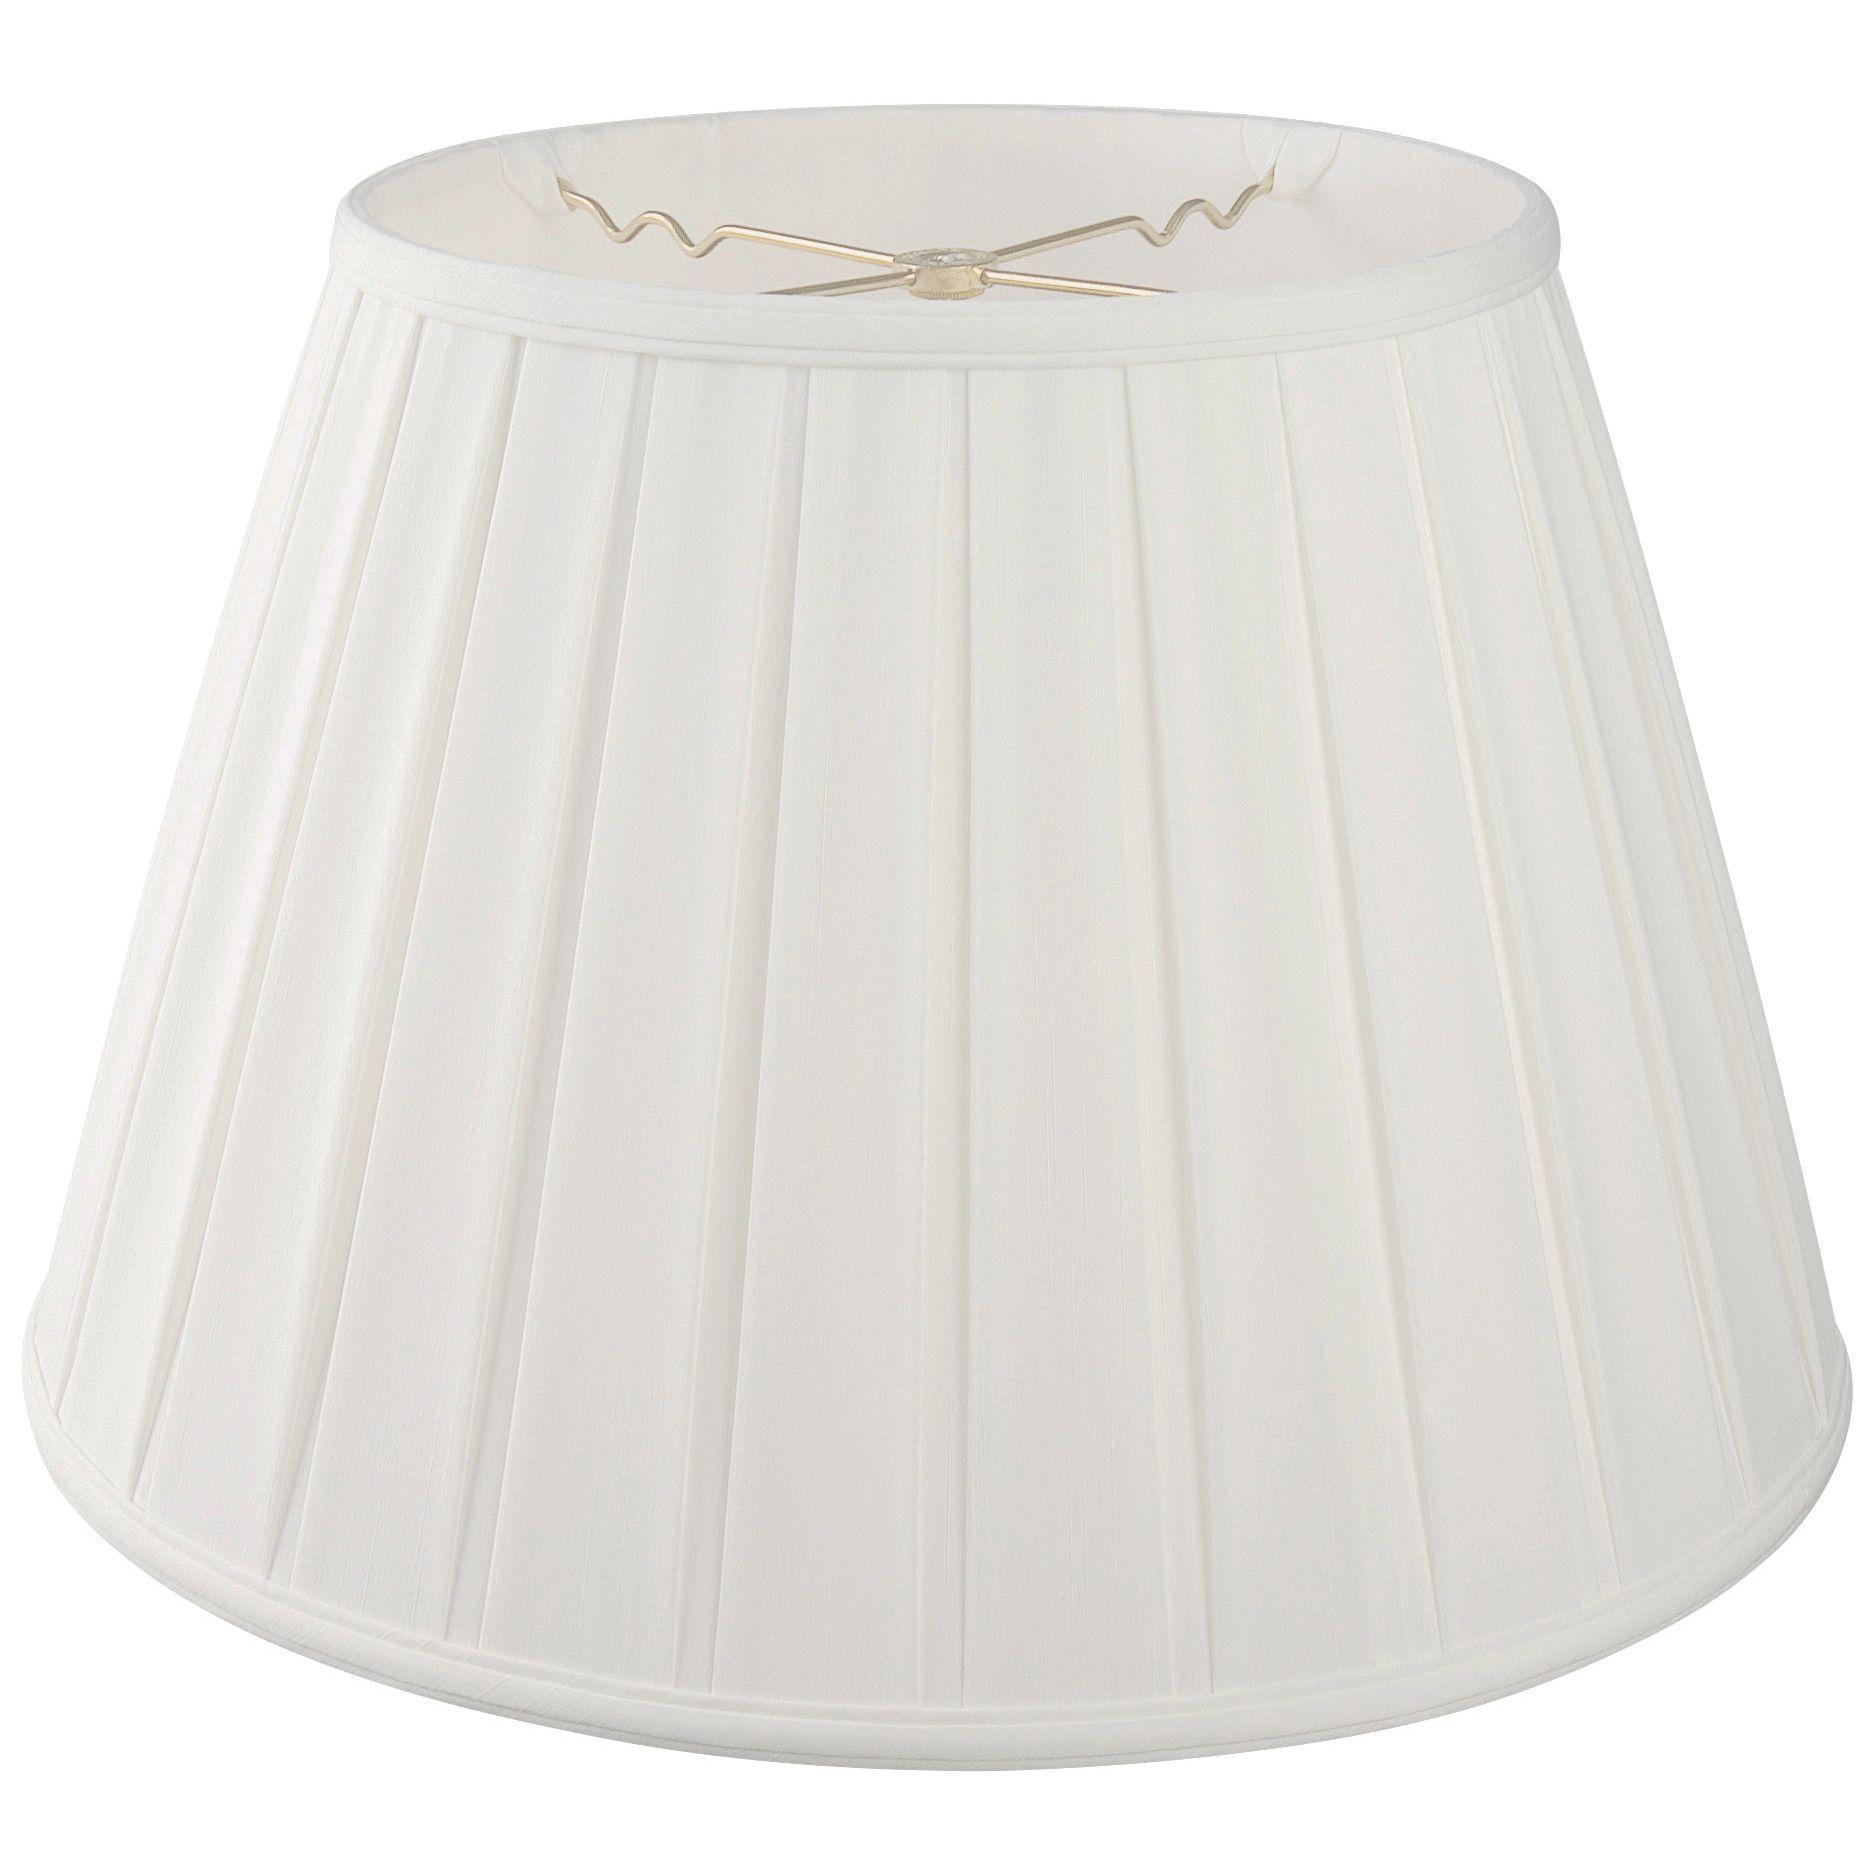 Royal Designs Empire English Pleat Basic Lamp Shade, White